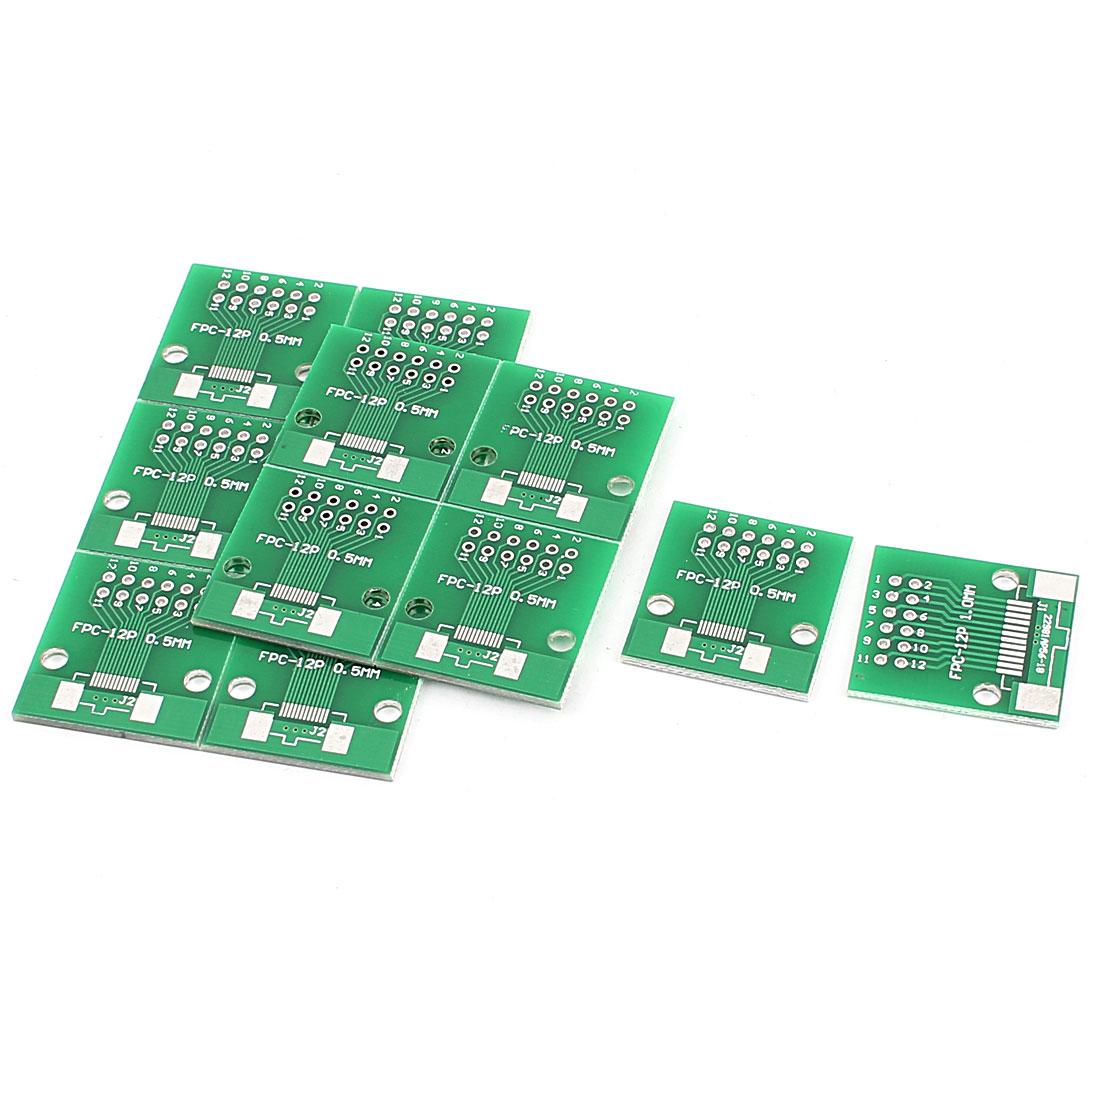 "12Pcs 24 x 26mm/0.9"" x 1"" FPC 12Pins Adapter PCB Converter Board"